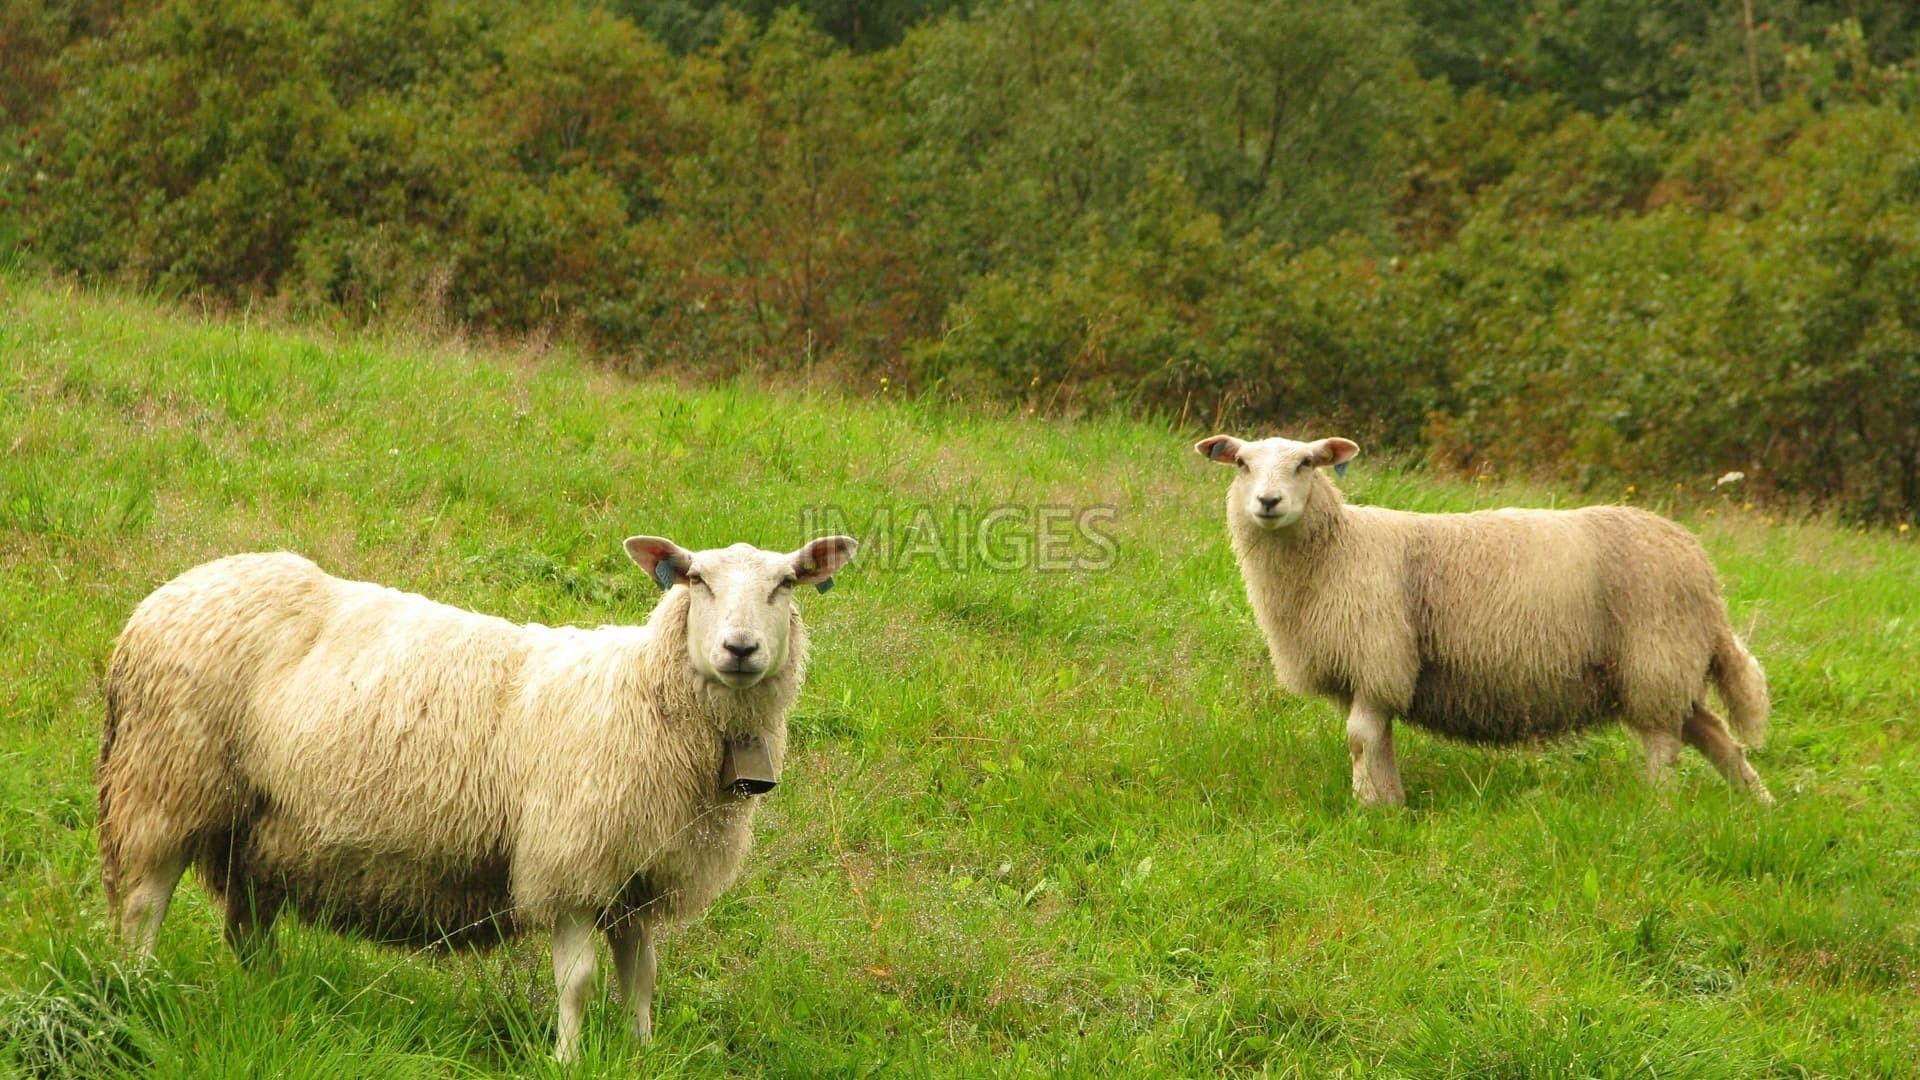 farm animals wallpaper (58+ images)